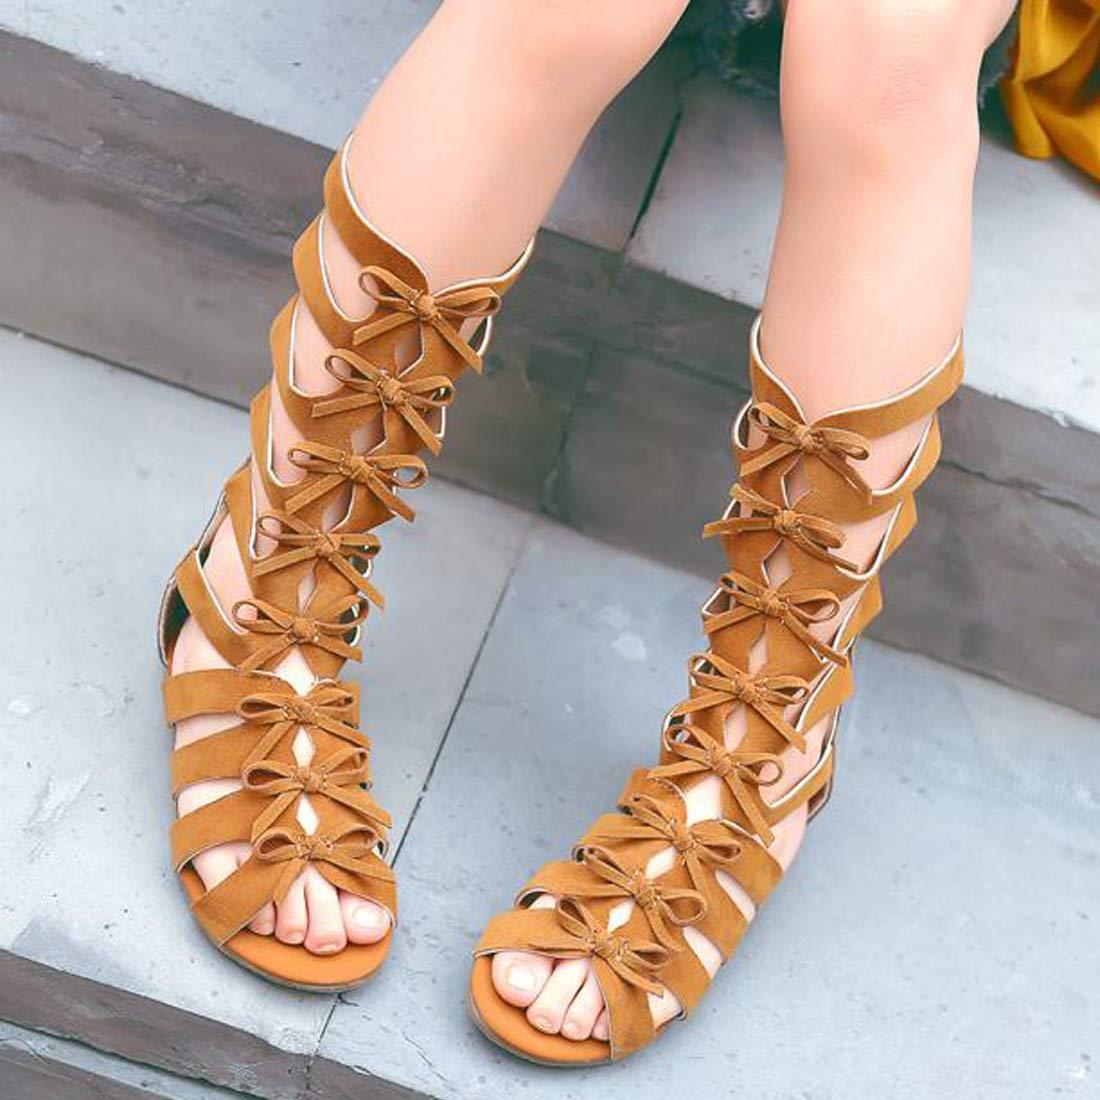 Yiwu Pengcai Girls Knee High Gladiator Sandals